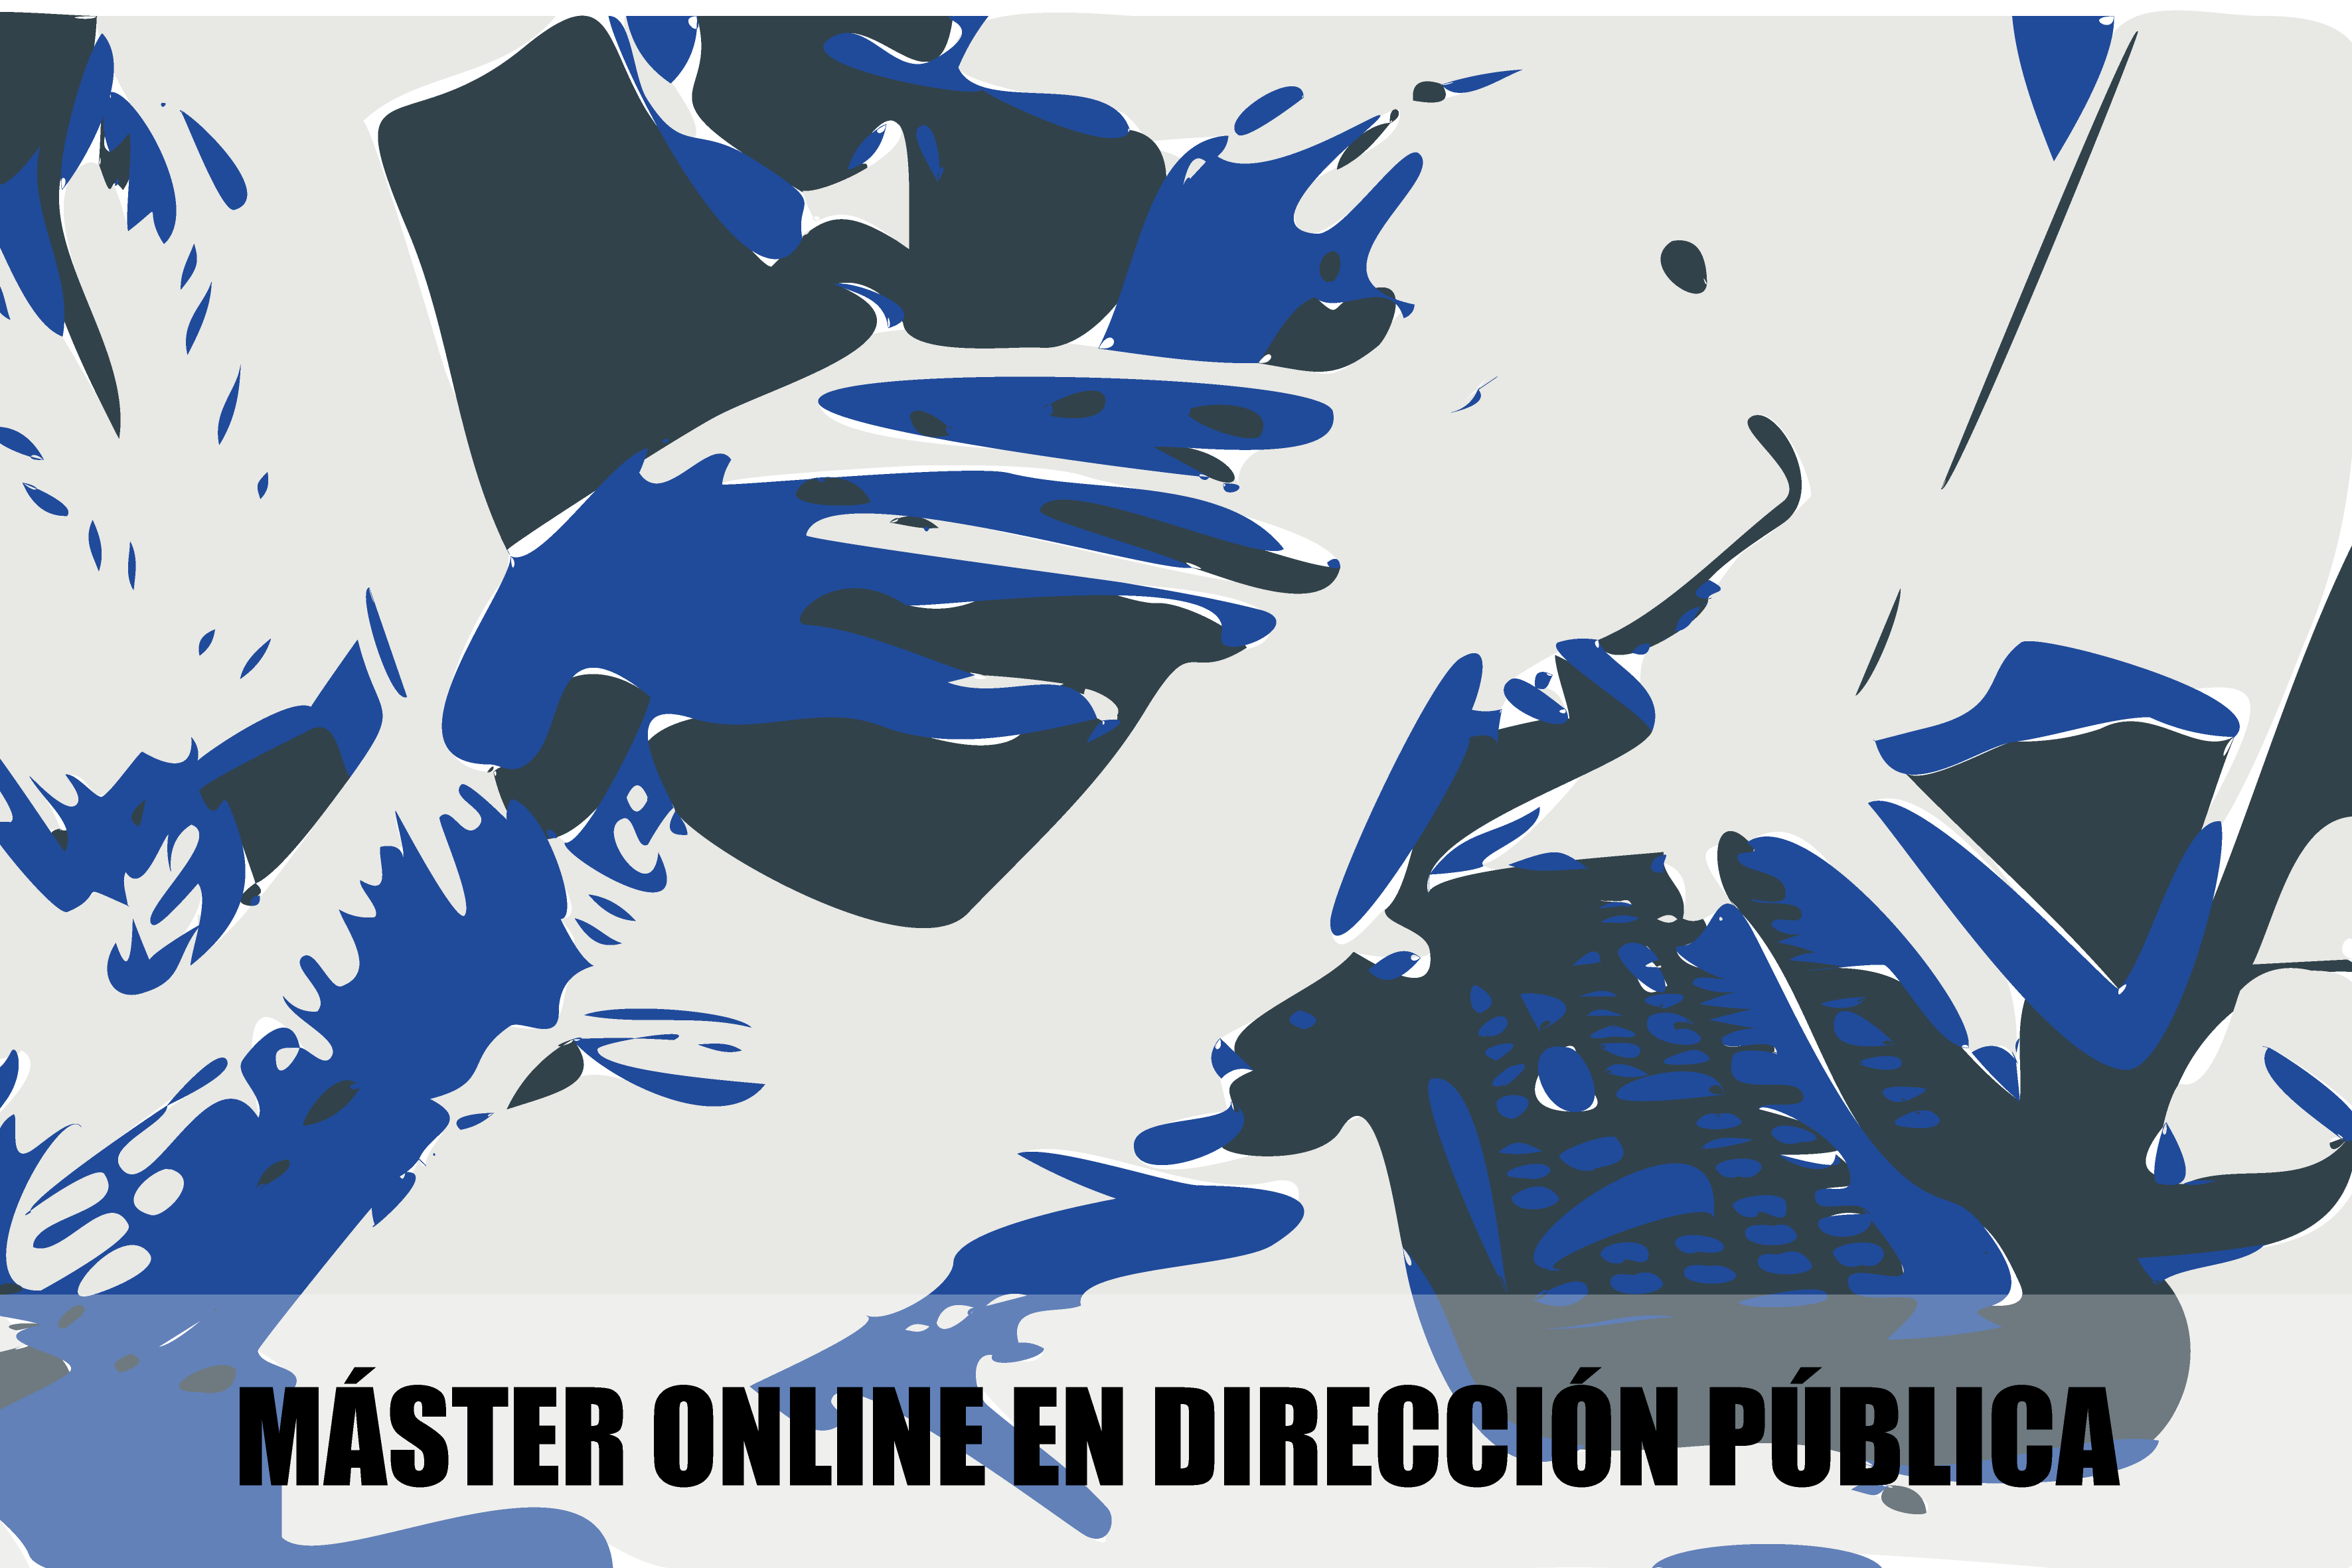 http://masterdireccionyliderazgo.com/